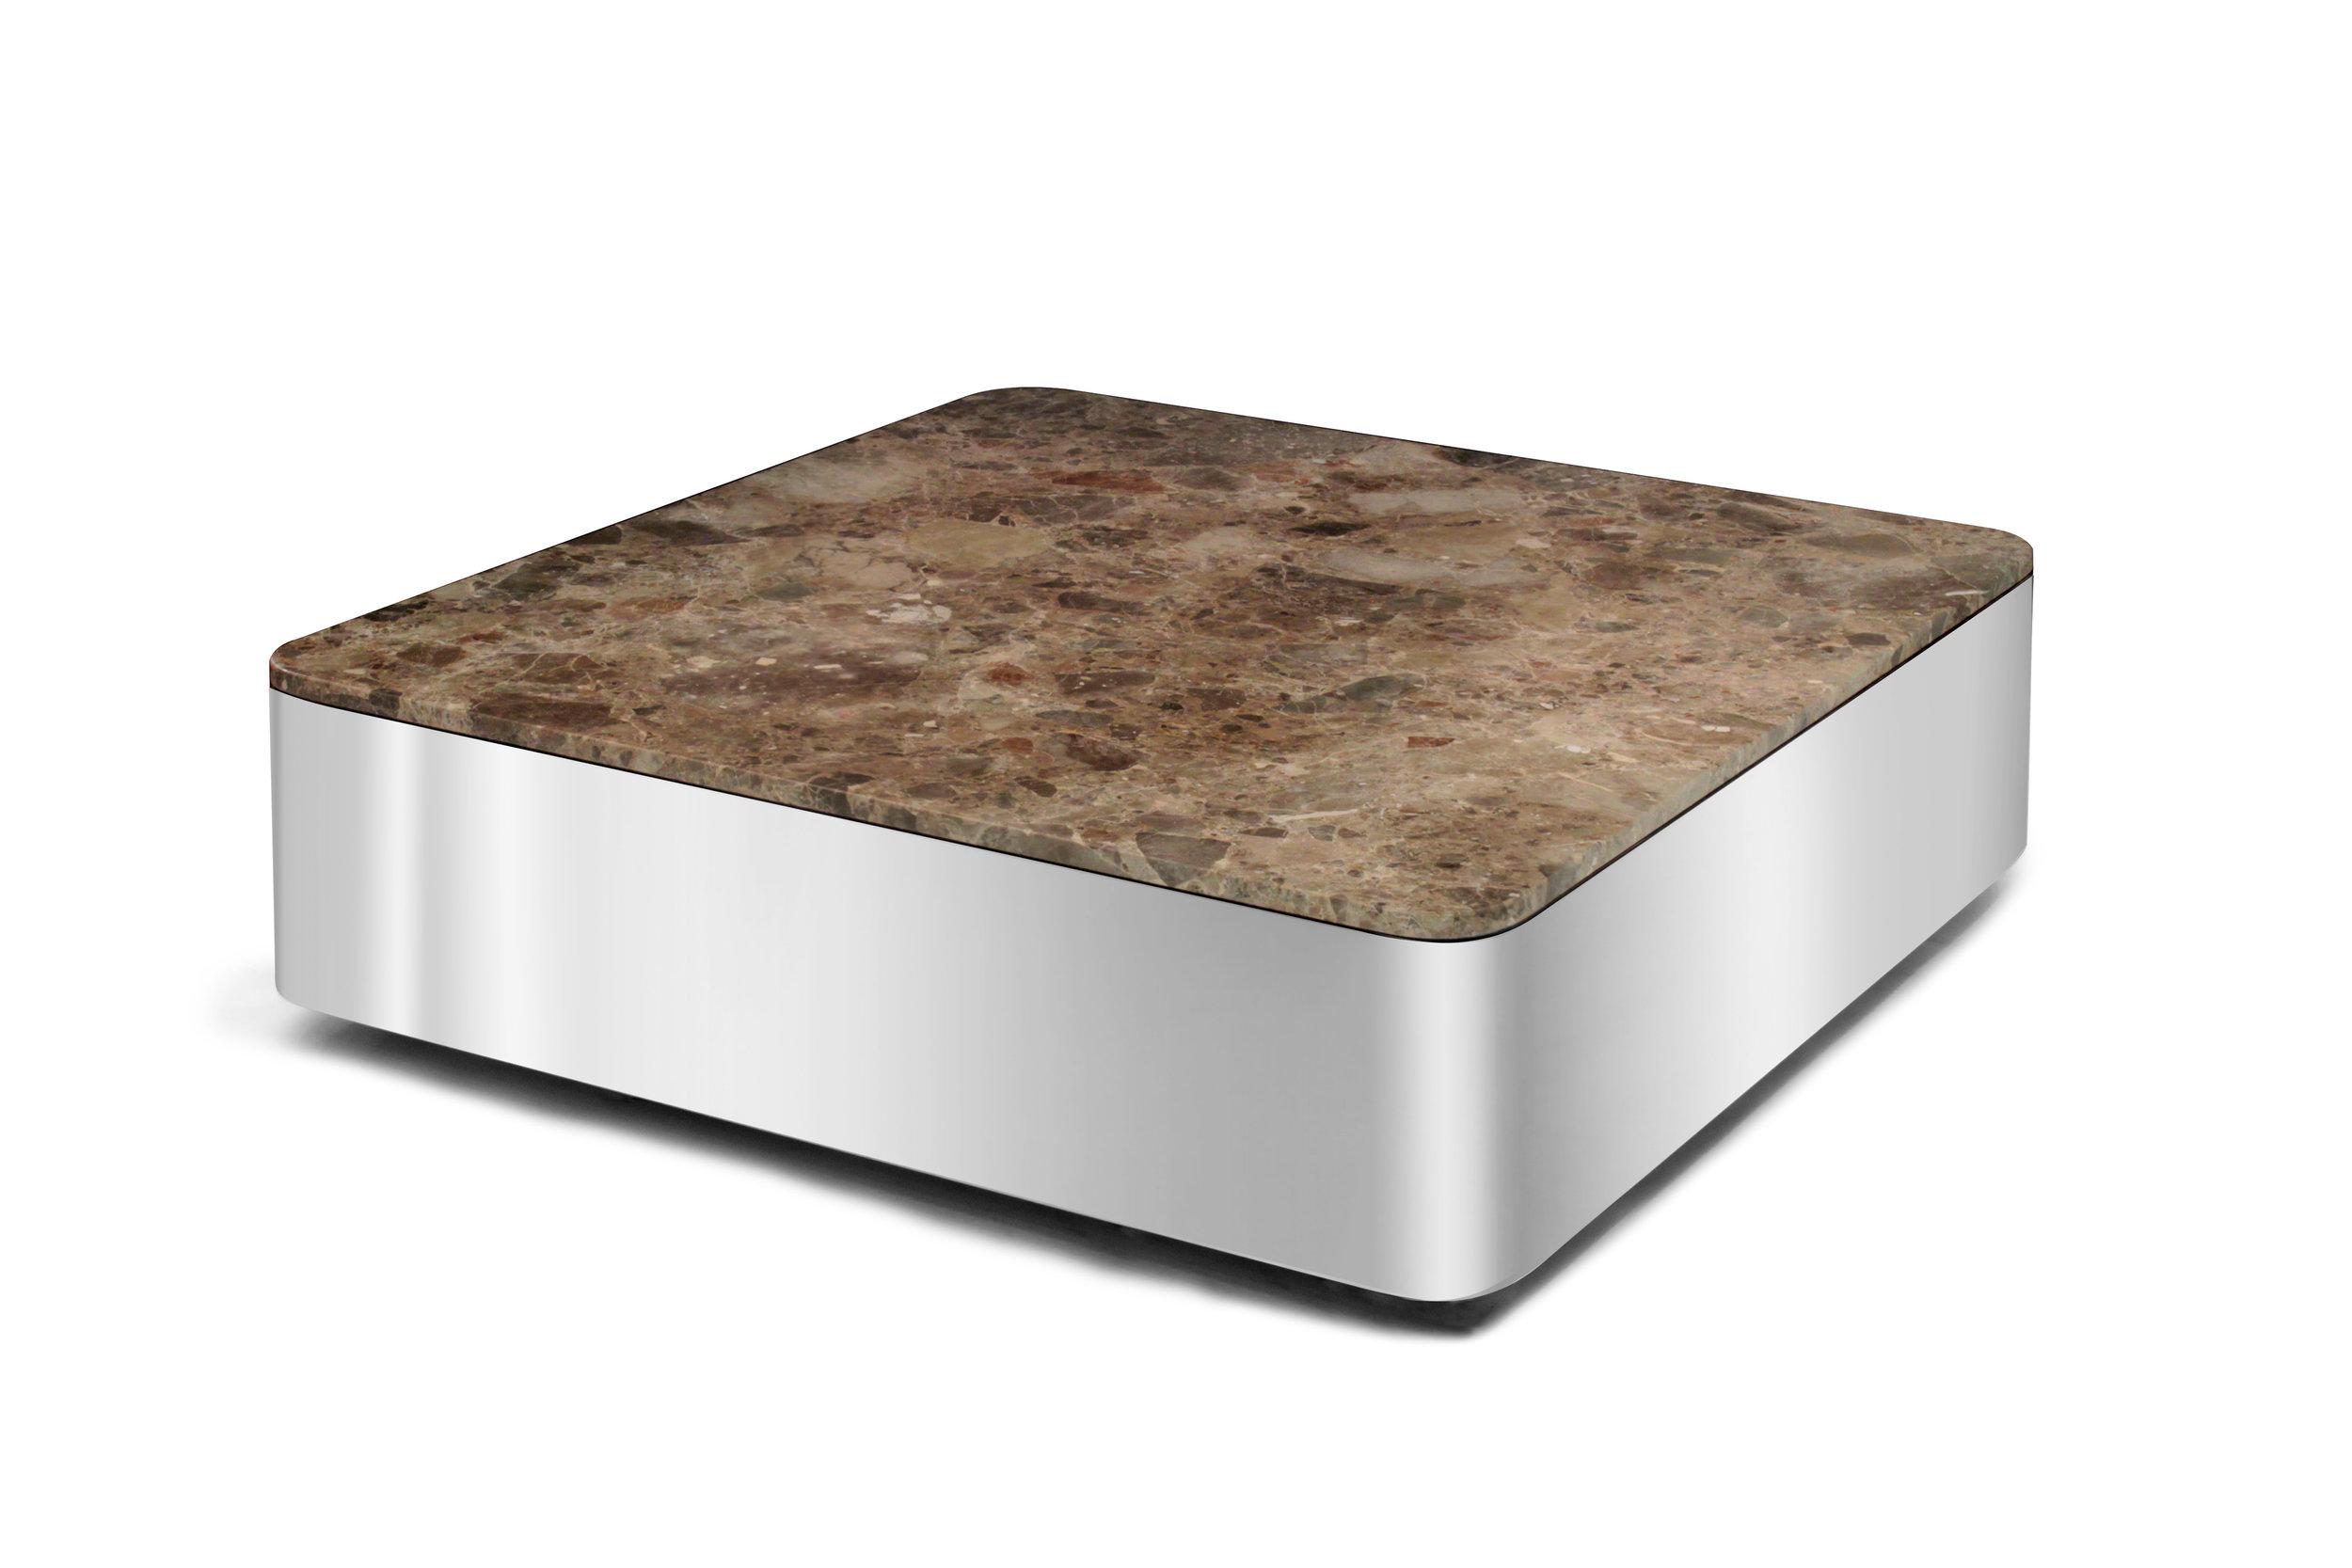 Brueton 85 polished steel+marble coffeetable75 hires.JPG